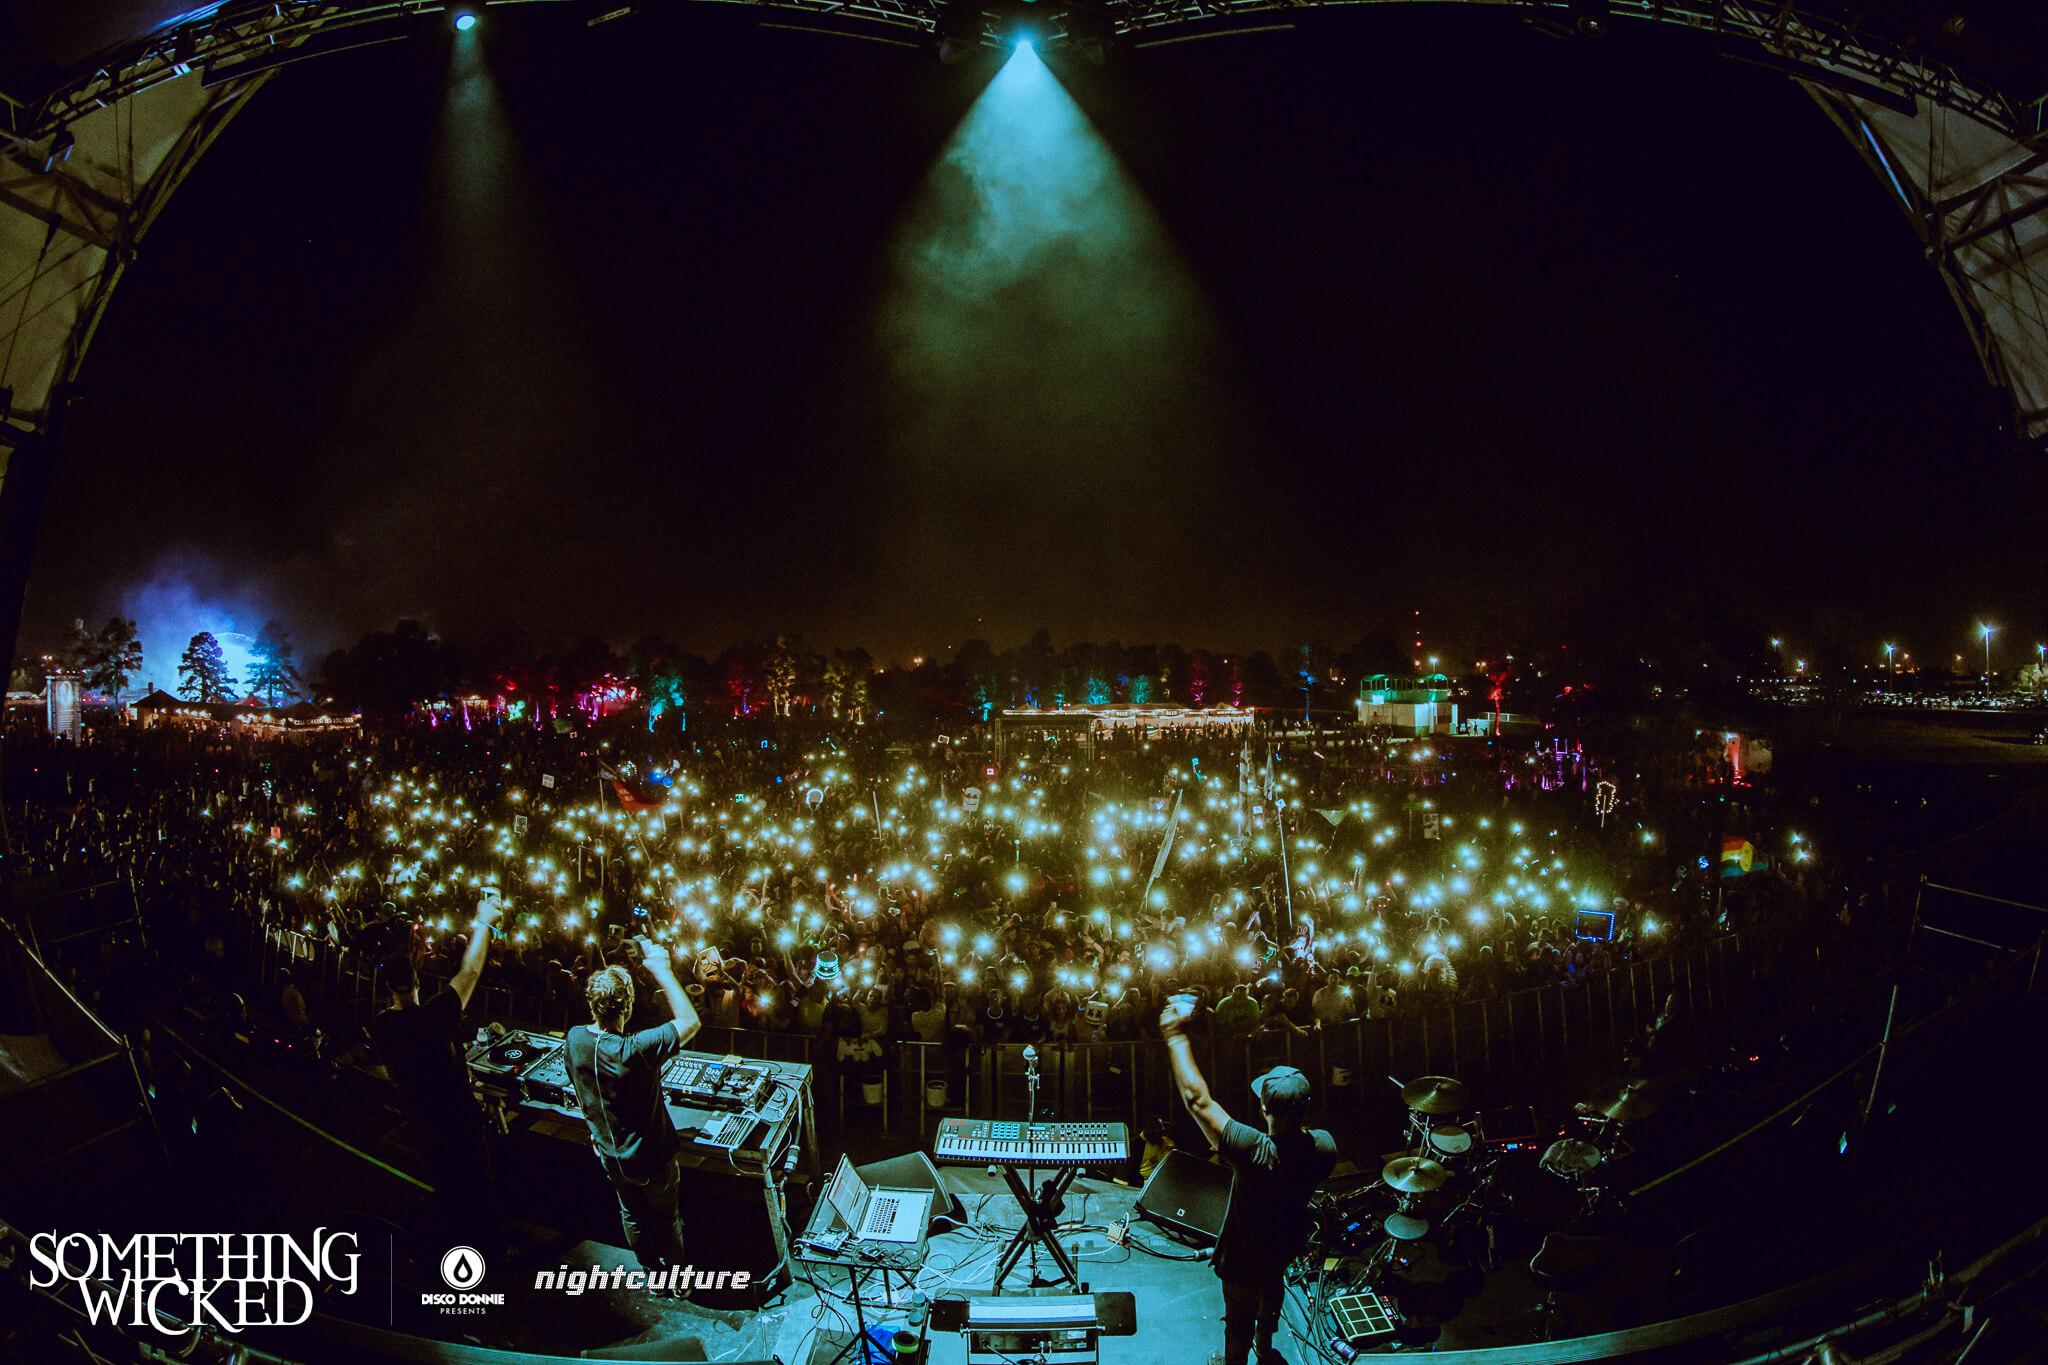 Keys N Krates performing at Something Wicked. Photo by Julian Bajsel.